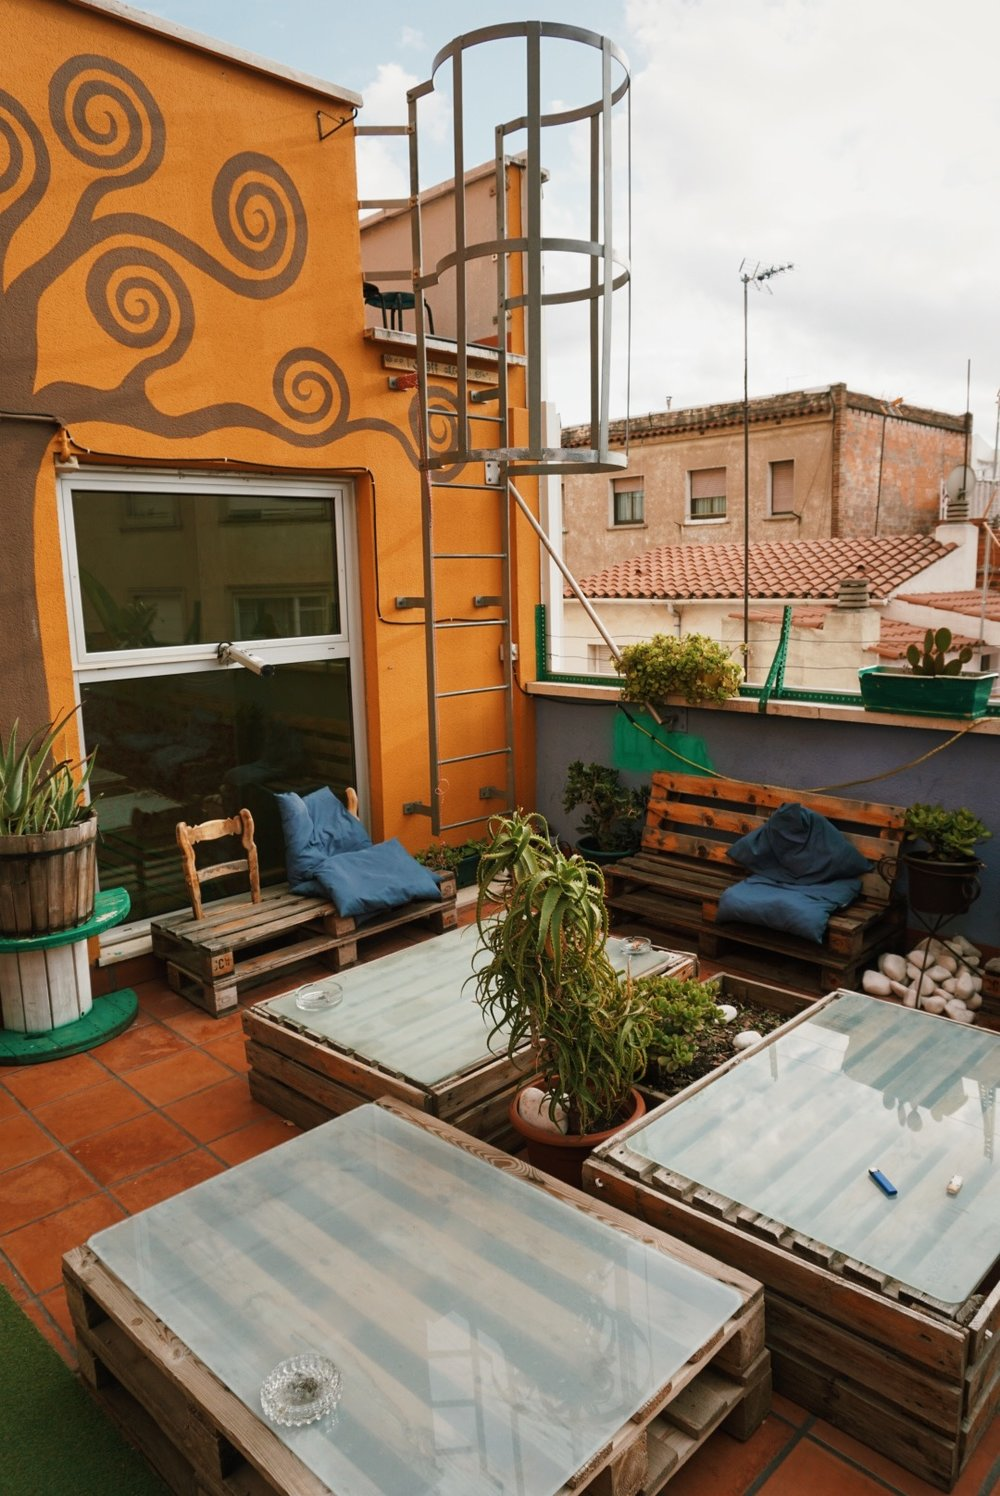 Blog Roamer Woman Average Cost Of Rewiring A Terraced House Hostel One Terrace Tree